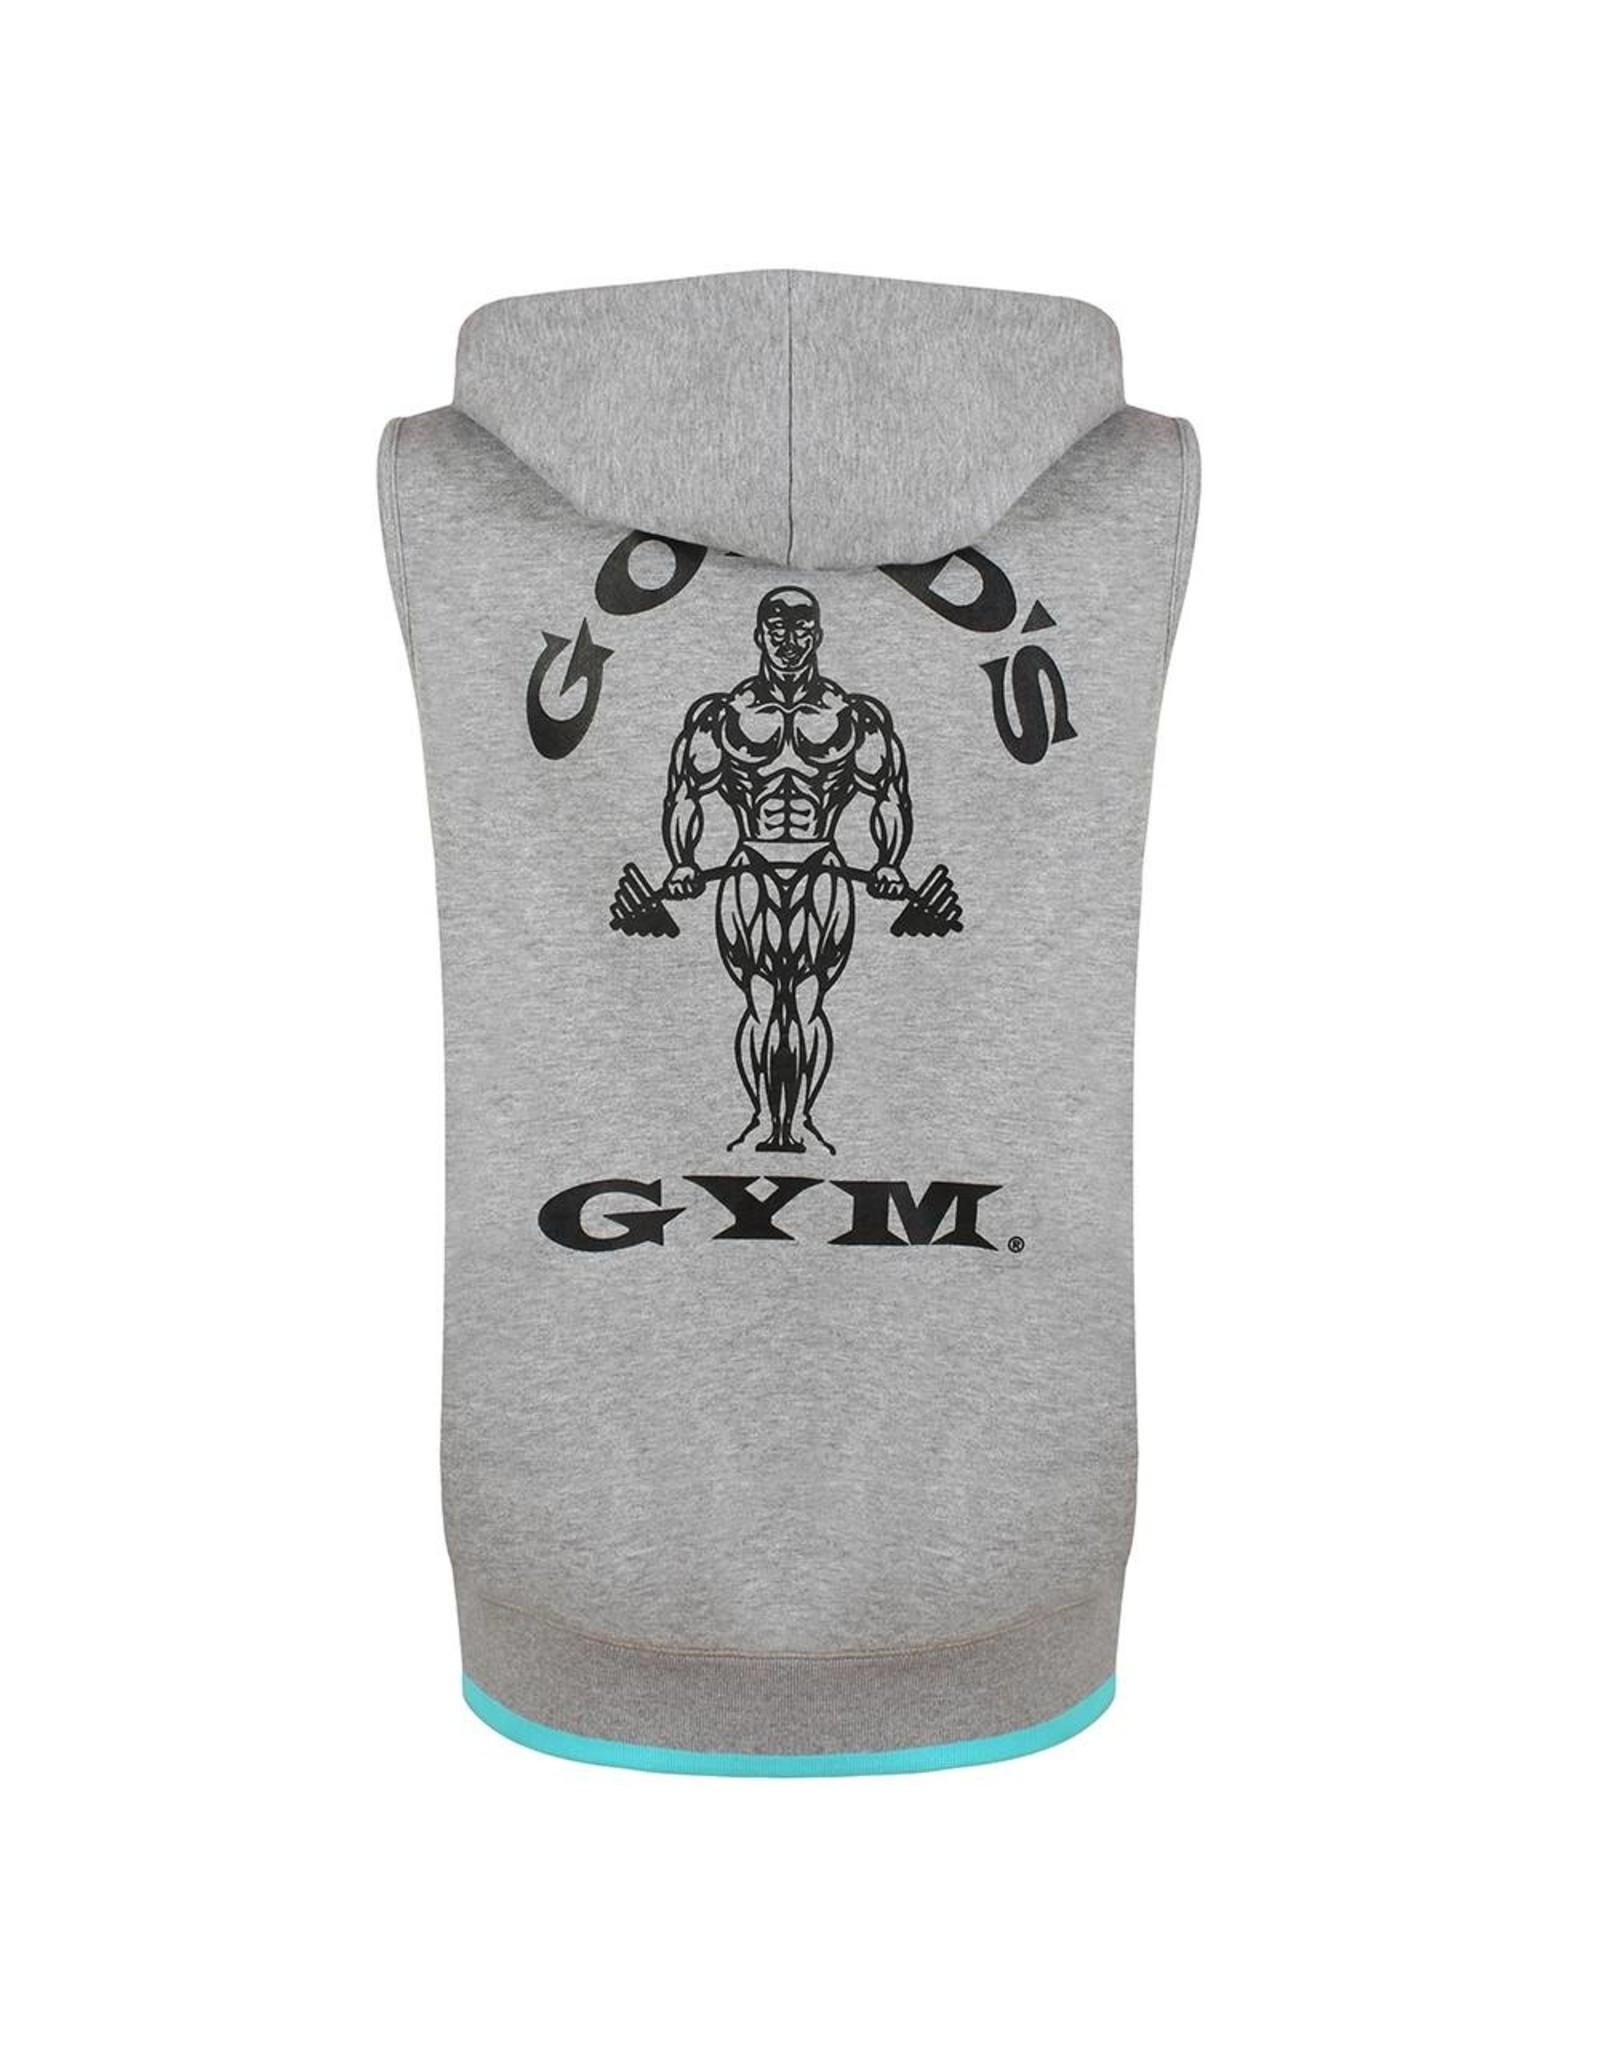 Gold's Gym Muscle Joe Premium Sleeveless Hoodie - Grey